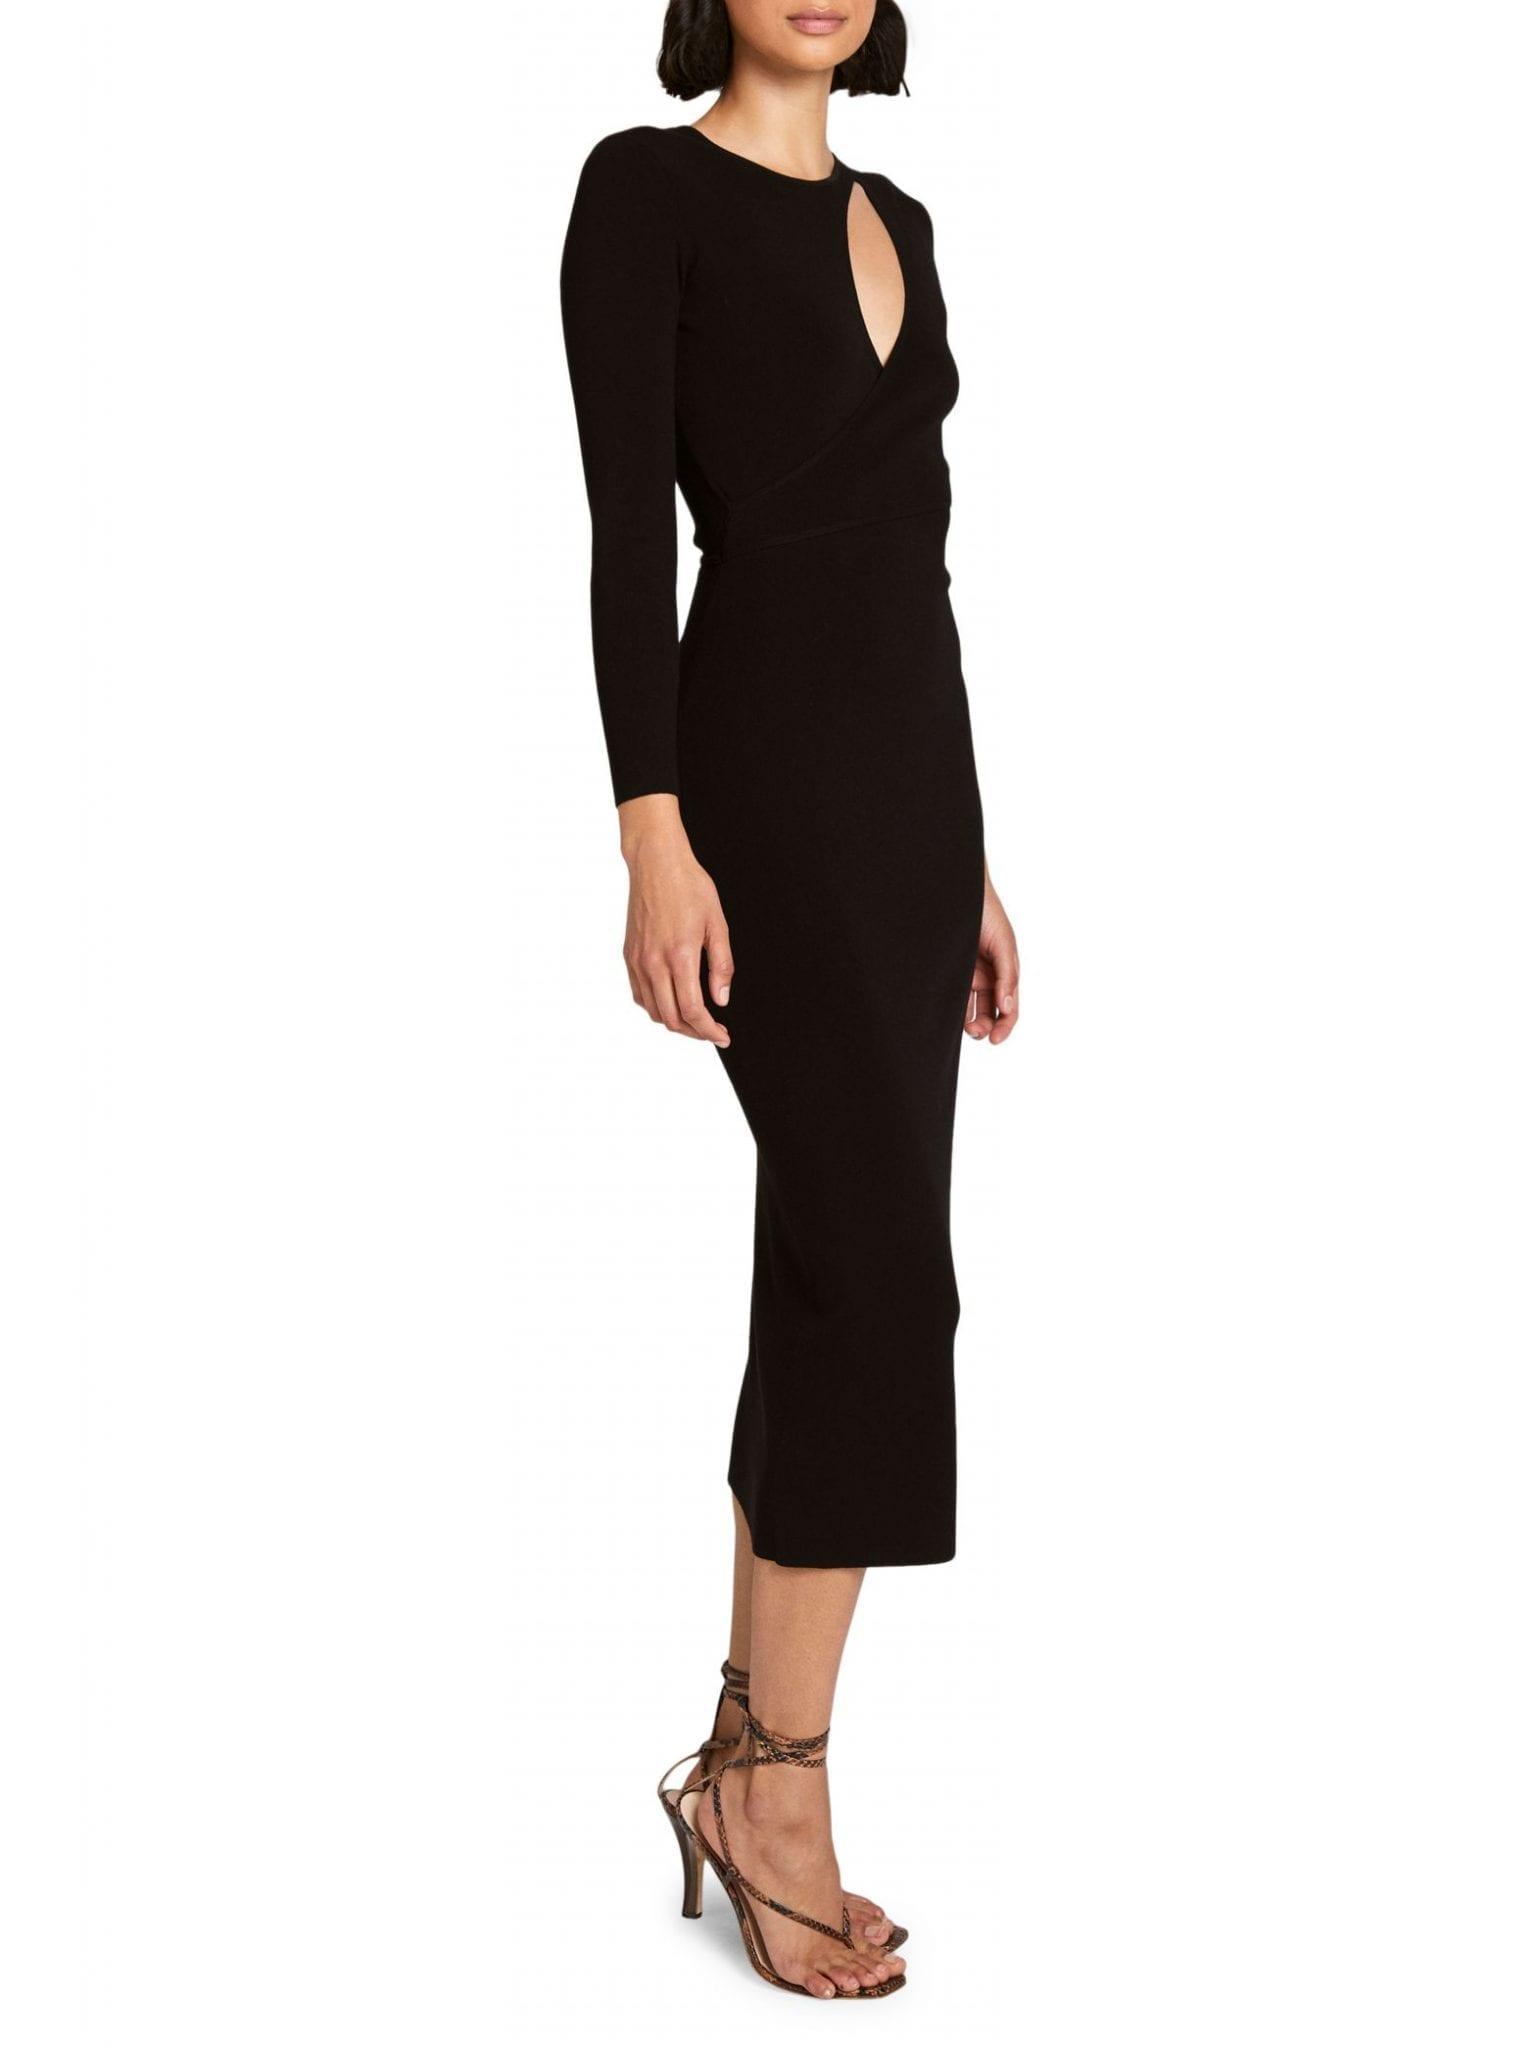 A.L.C. Lorelei Cutout Midi Dress